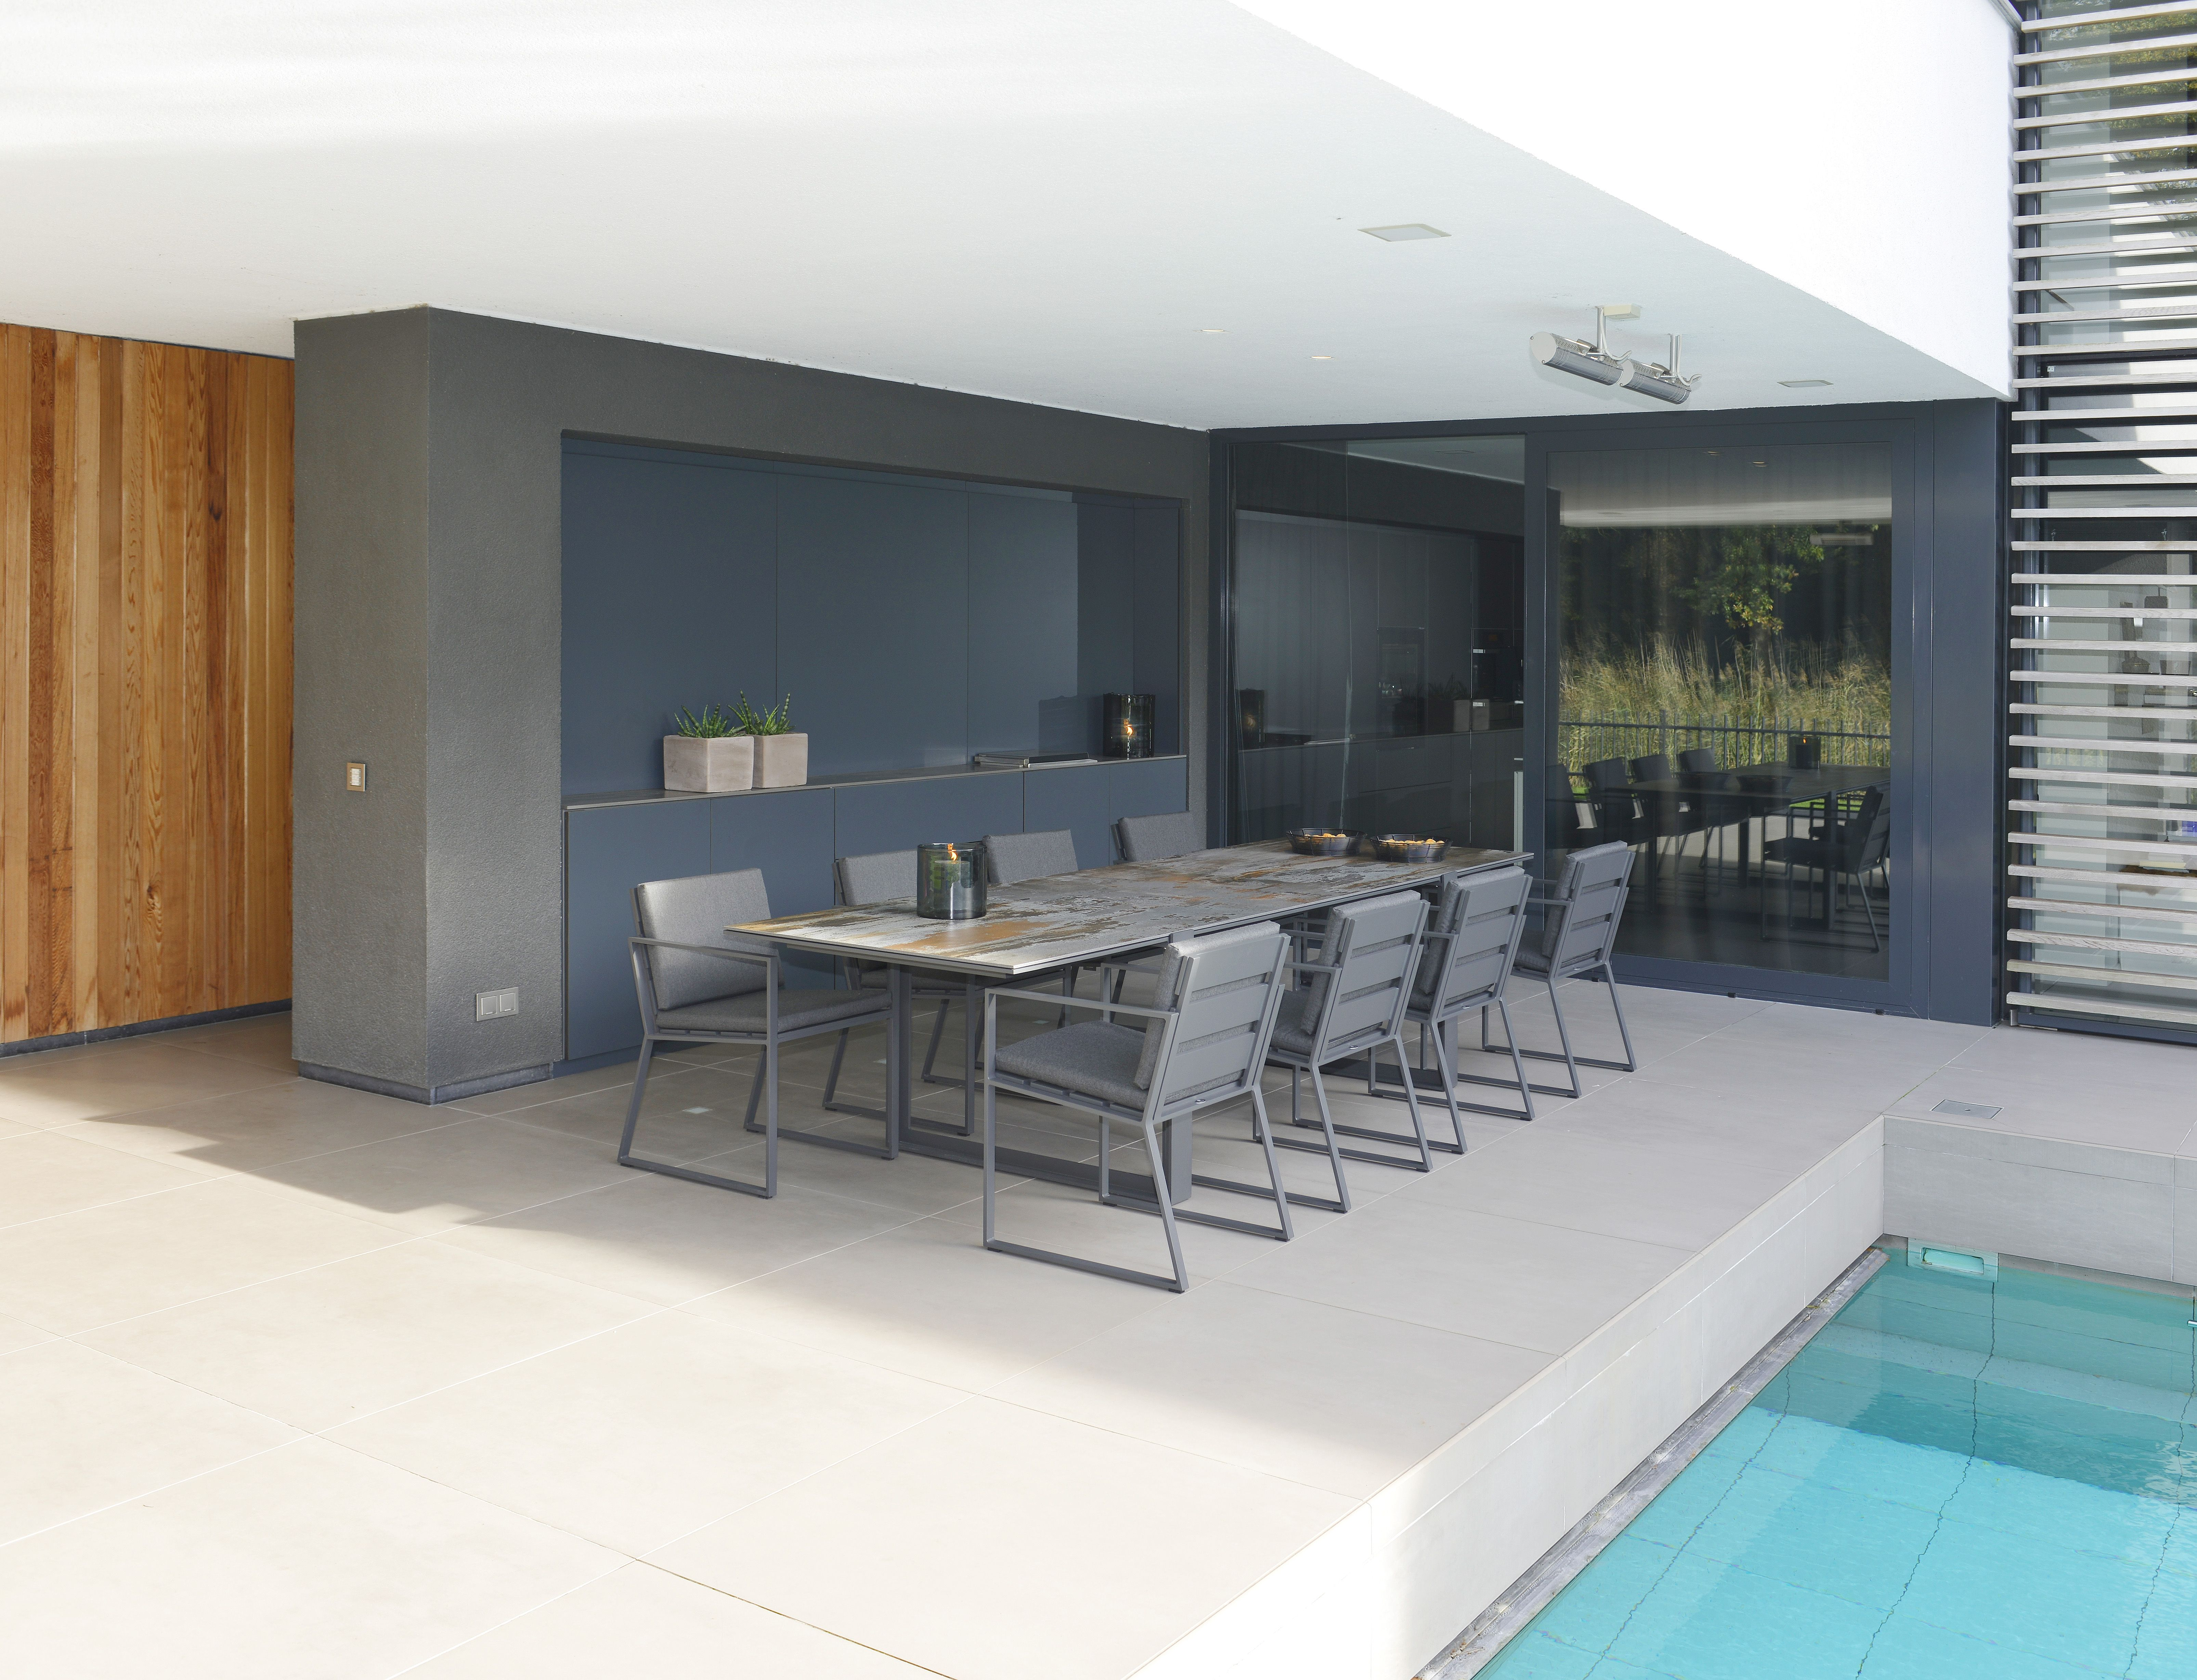 Rl interior concepts outdoor furniture borek collection